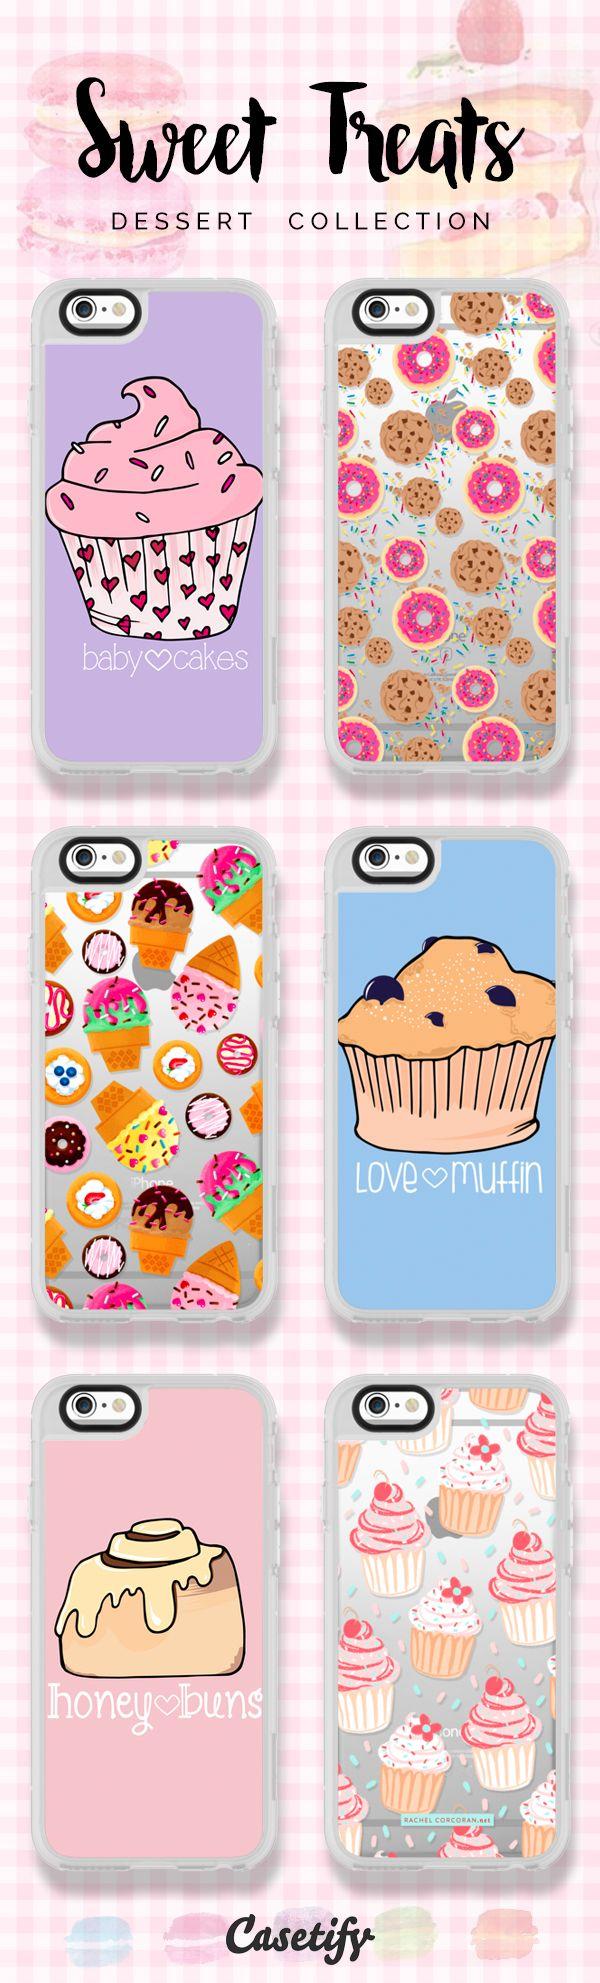 #Sweet Treats. This phone cases make the day more sweet  No hace más dulce tu día estas carcasas? #phonecase